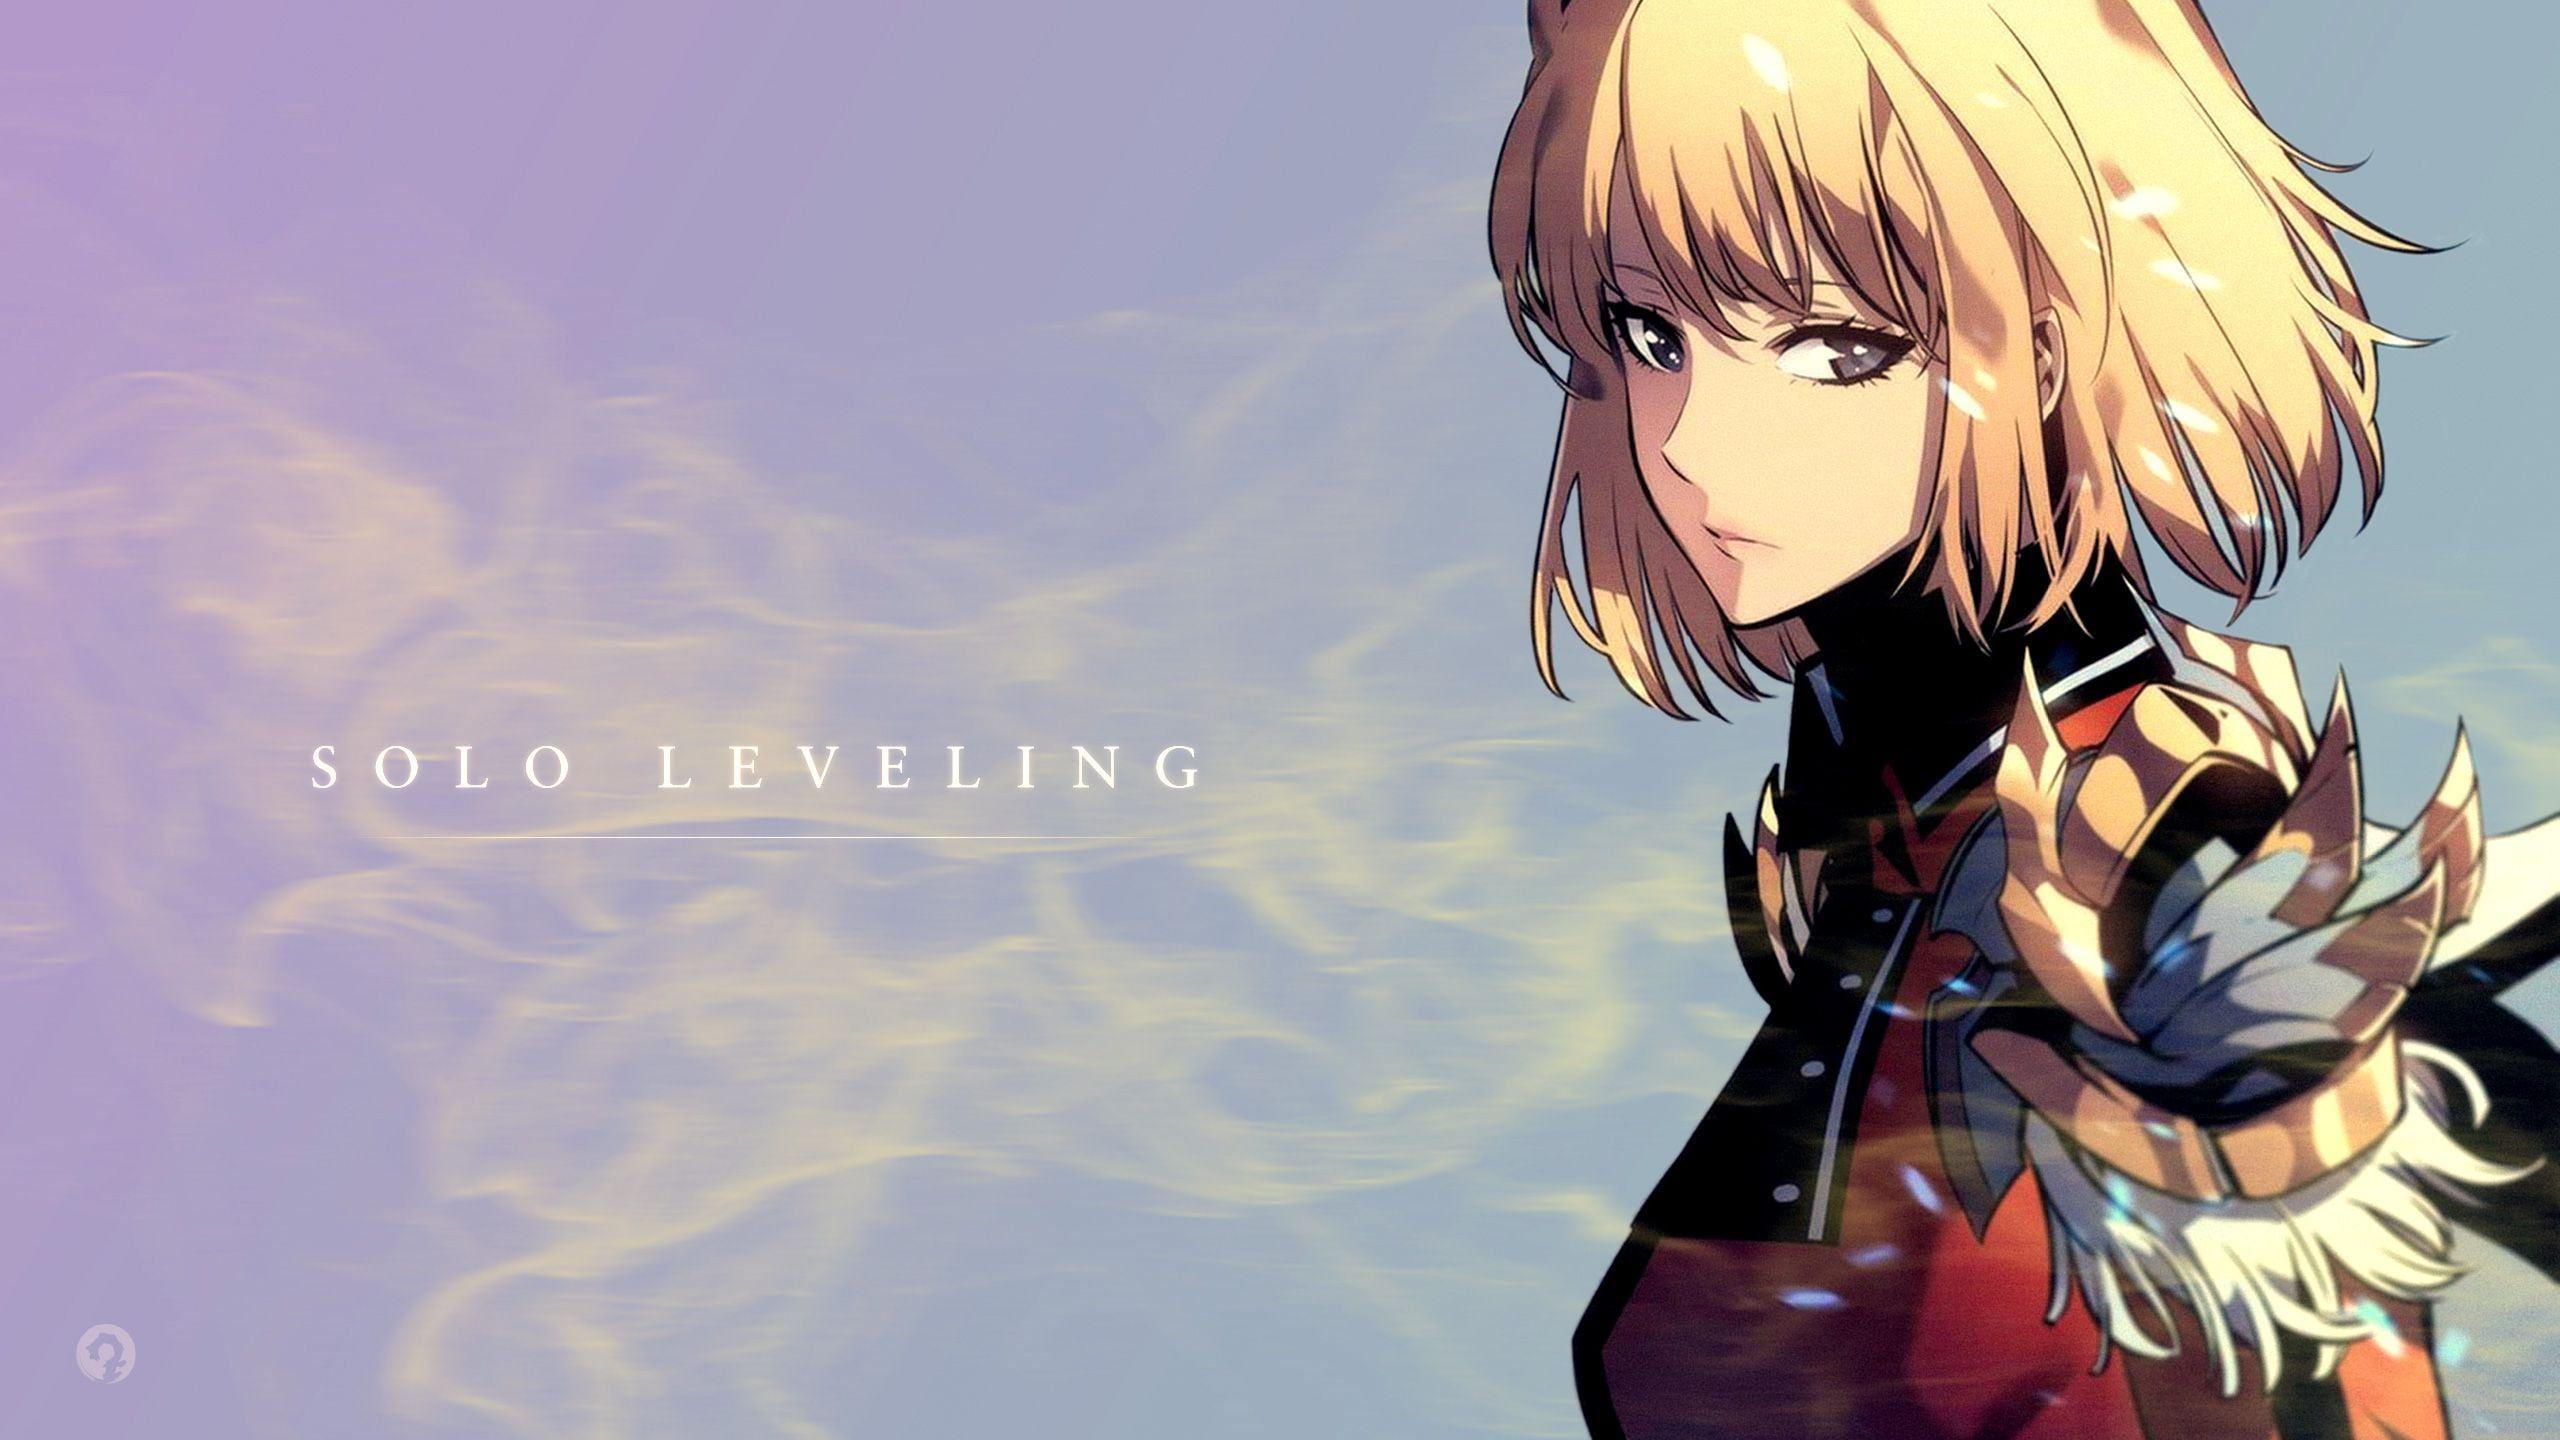 Anime Solo Leveling Cha Hae In 2k Wallpaper Hdwallpaper Desktop Animasi Gambar Anime Gambar